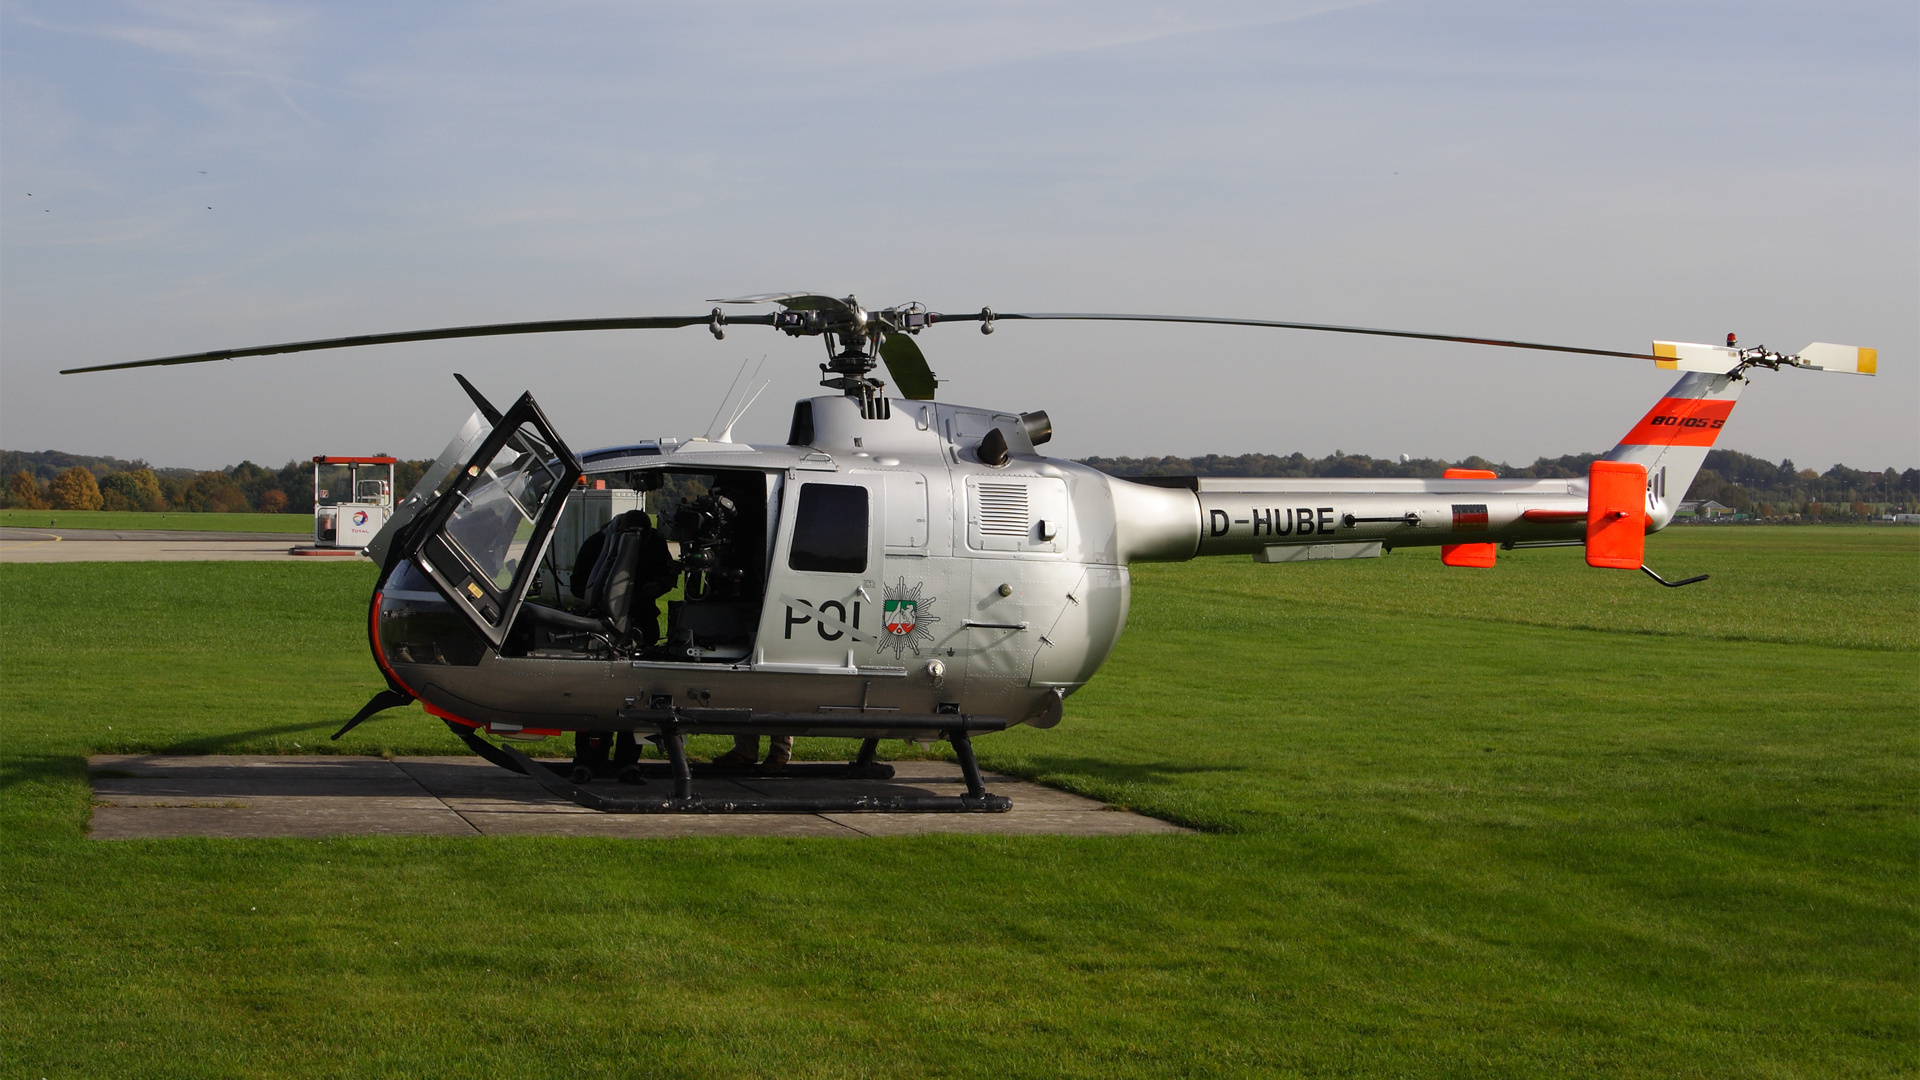 D-HUBE-1 BO105 ESS 200810